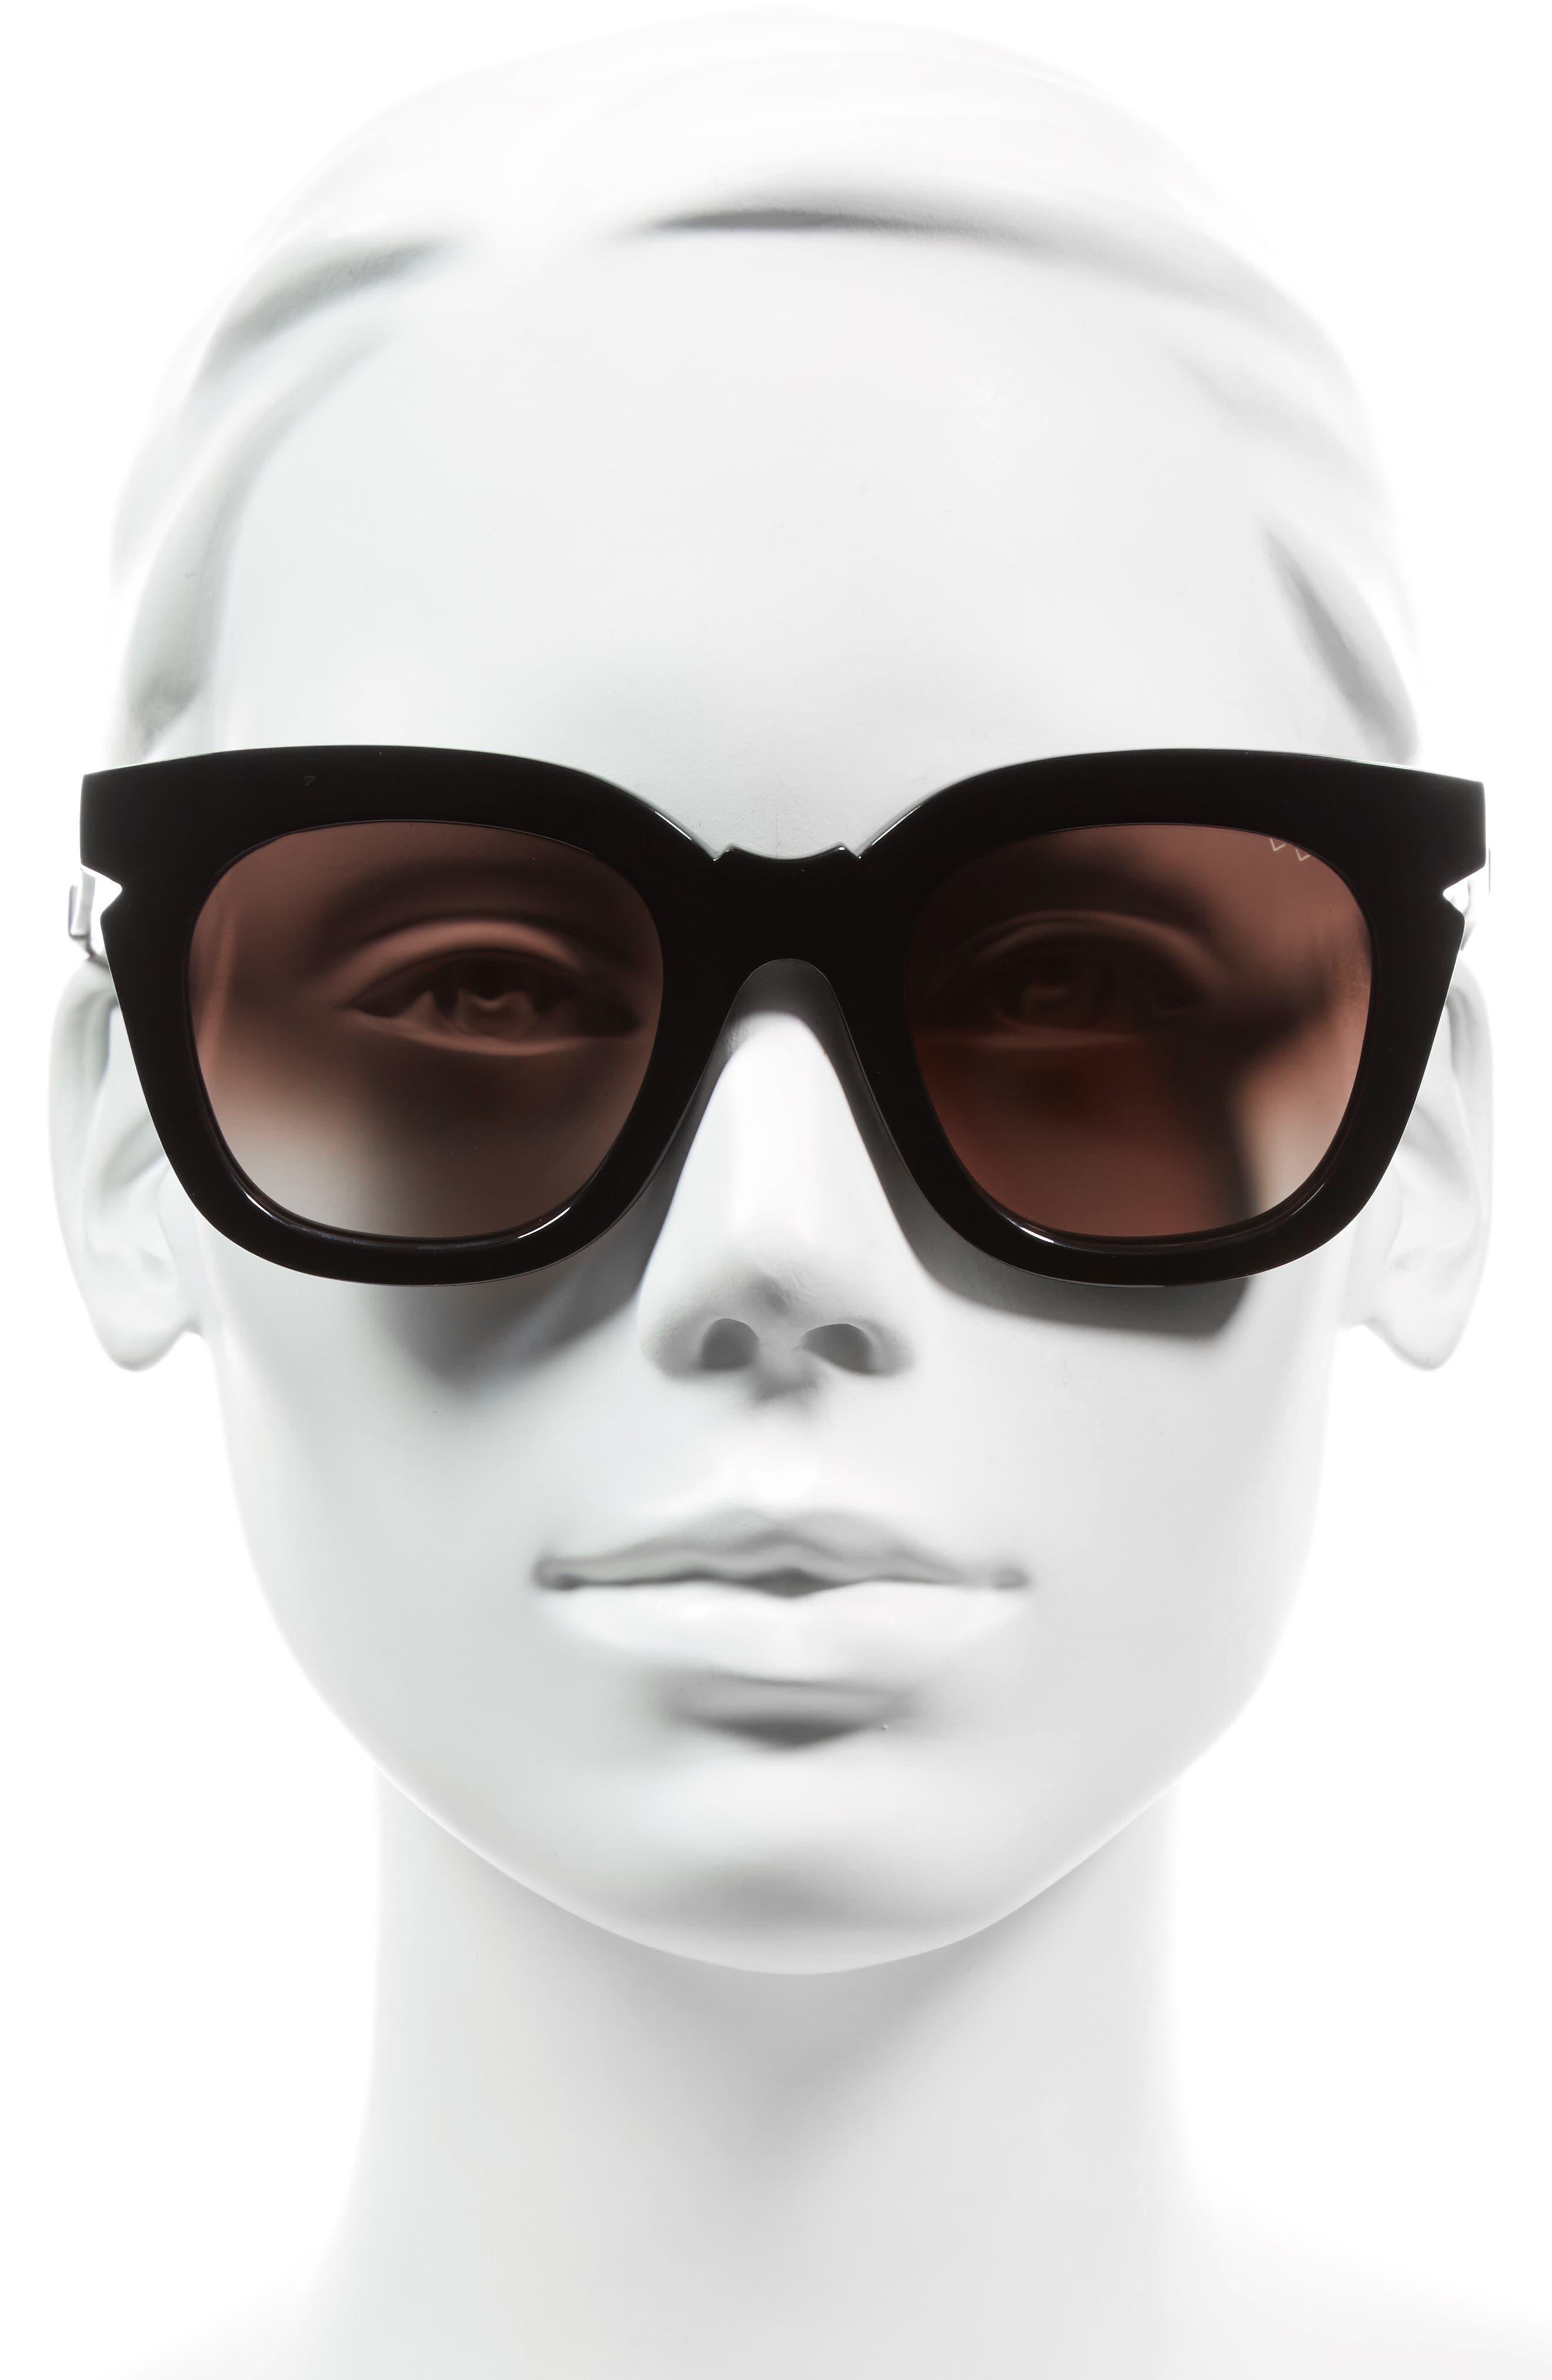 Pools & Palms 50mm Sunglasses,                             Alternate thumbnail 2, color,                             BLACK/ BROWN